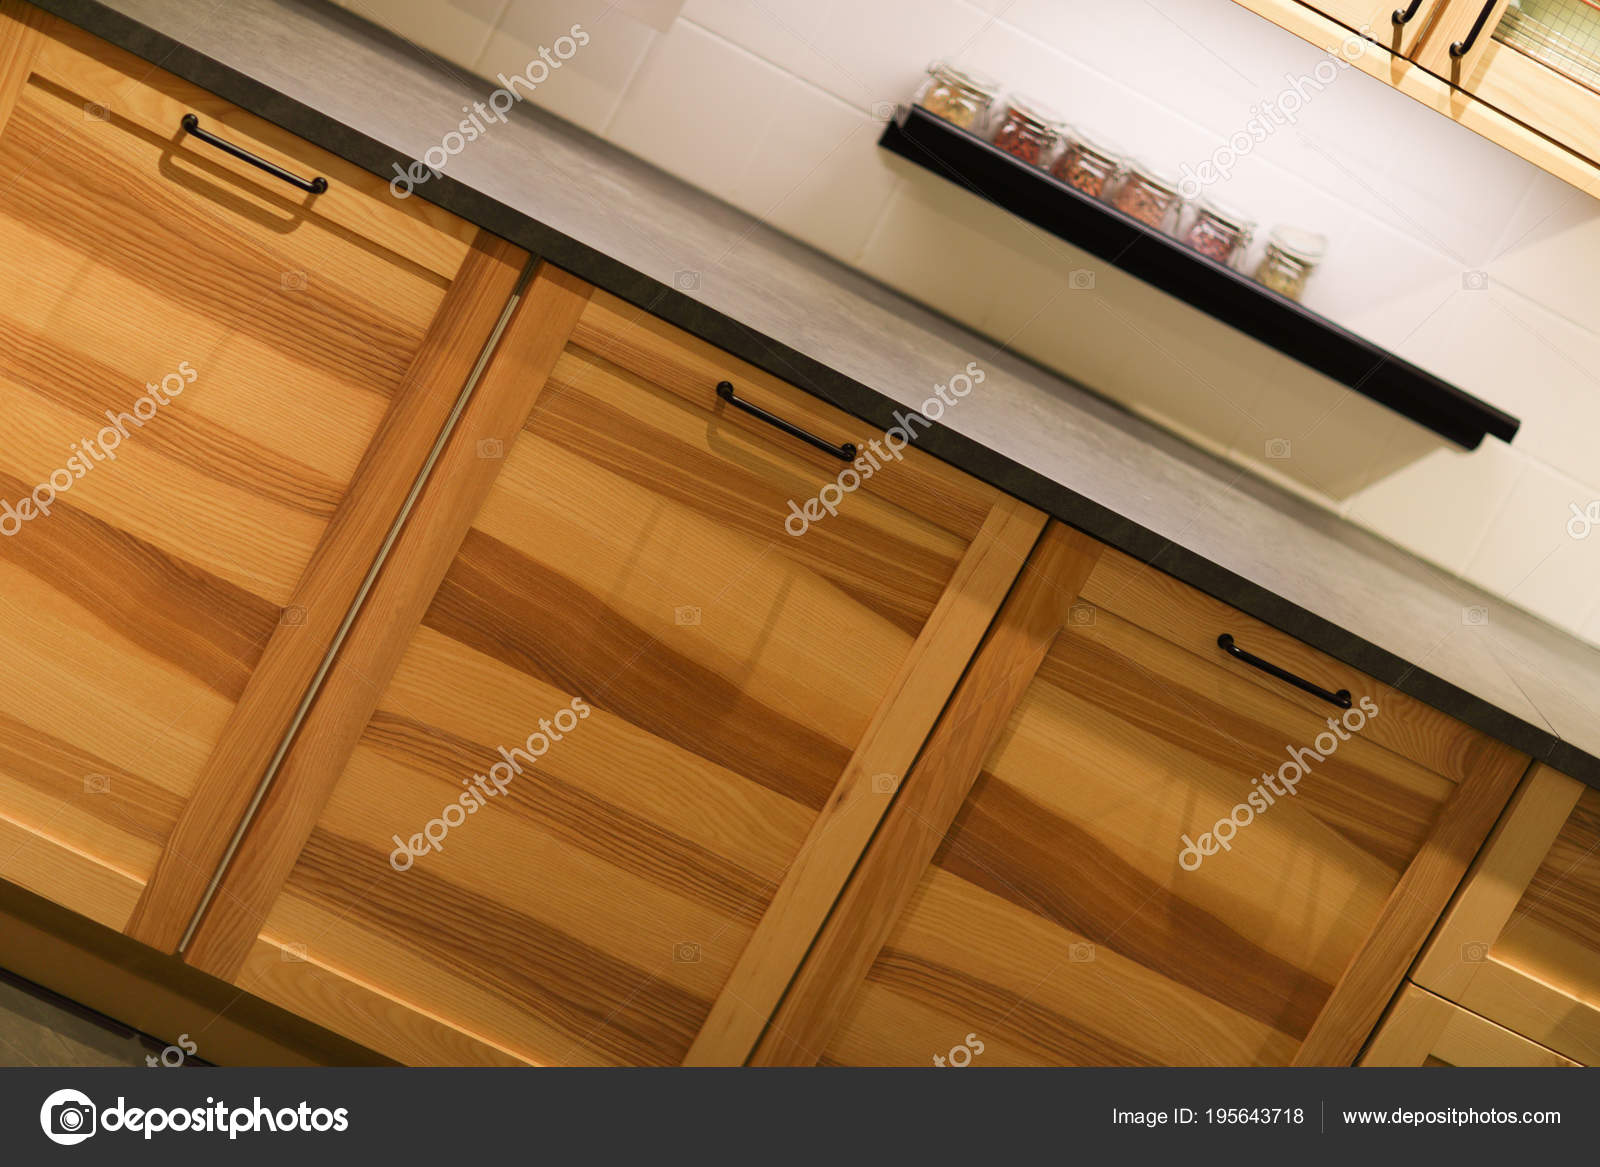 Moderne Nederlandse Keuken : Moderne houten keukenkasten geschoten met nederlandse kantelen hoek